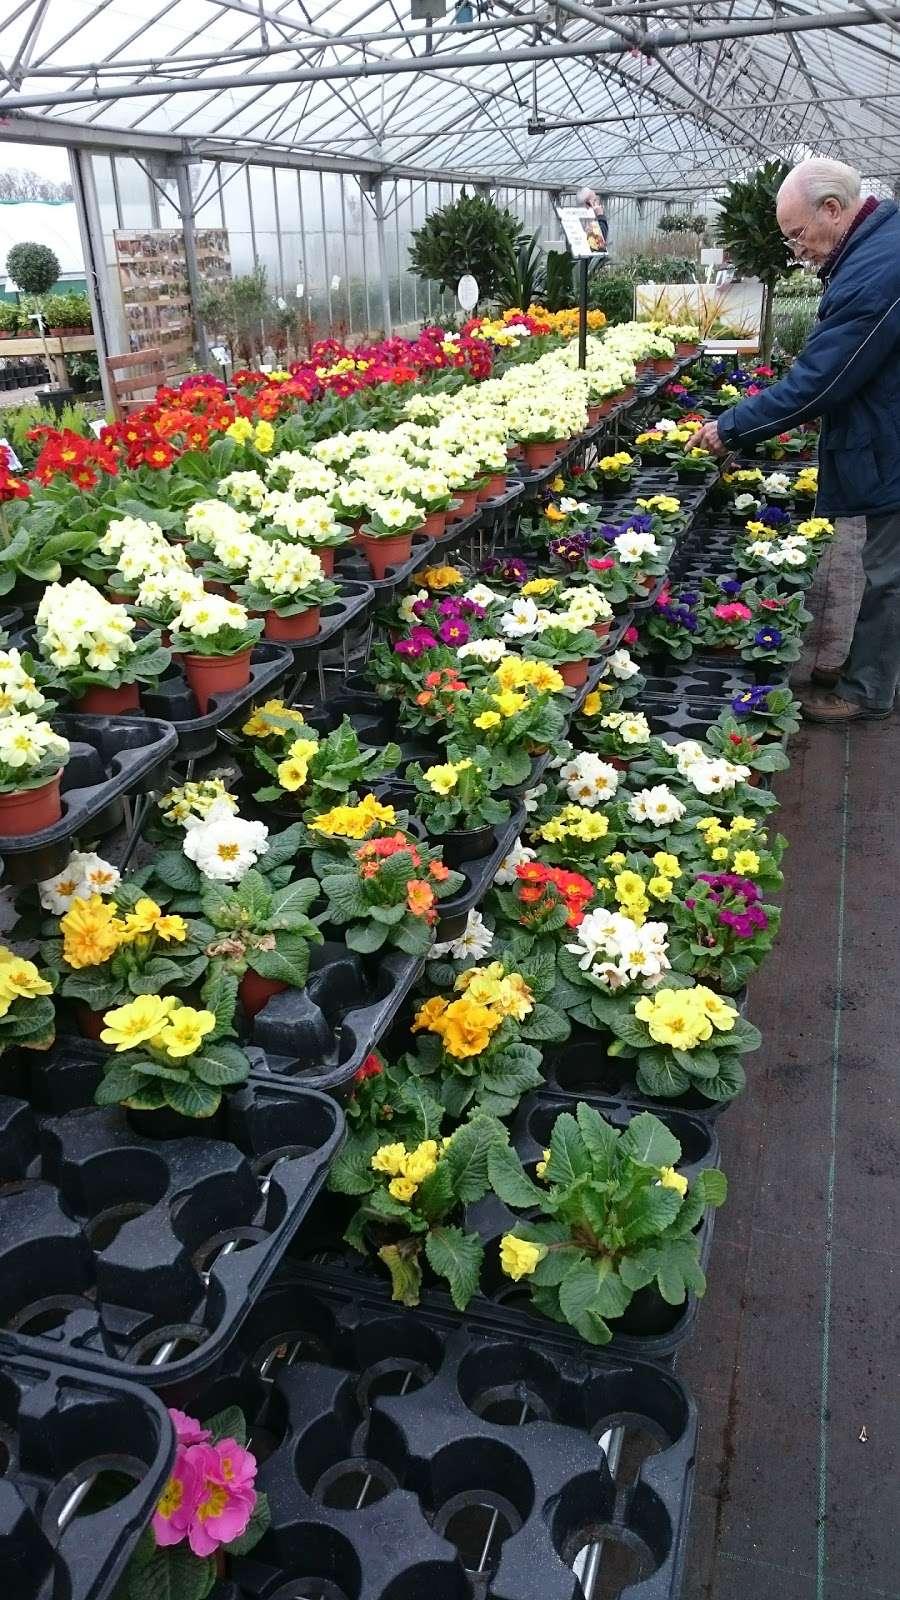 Matthews Plants - store  | Photo 3 of 10 | Address: Hadley Nursery, Tylers Rd, Roydon, Harlow CM19 5LJ, UK | Phone: 01279 793539